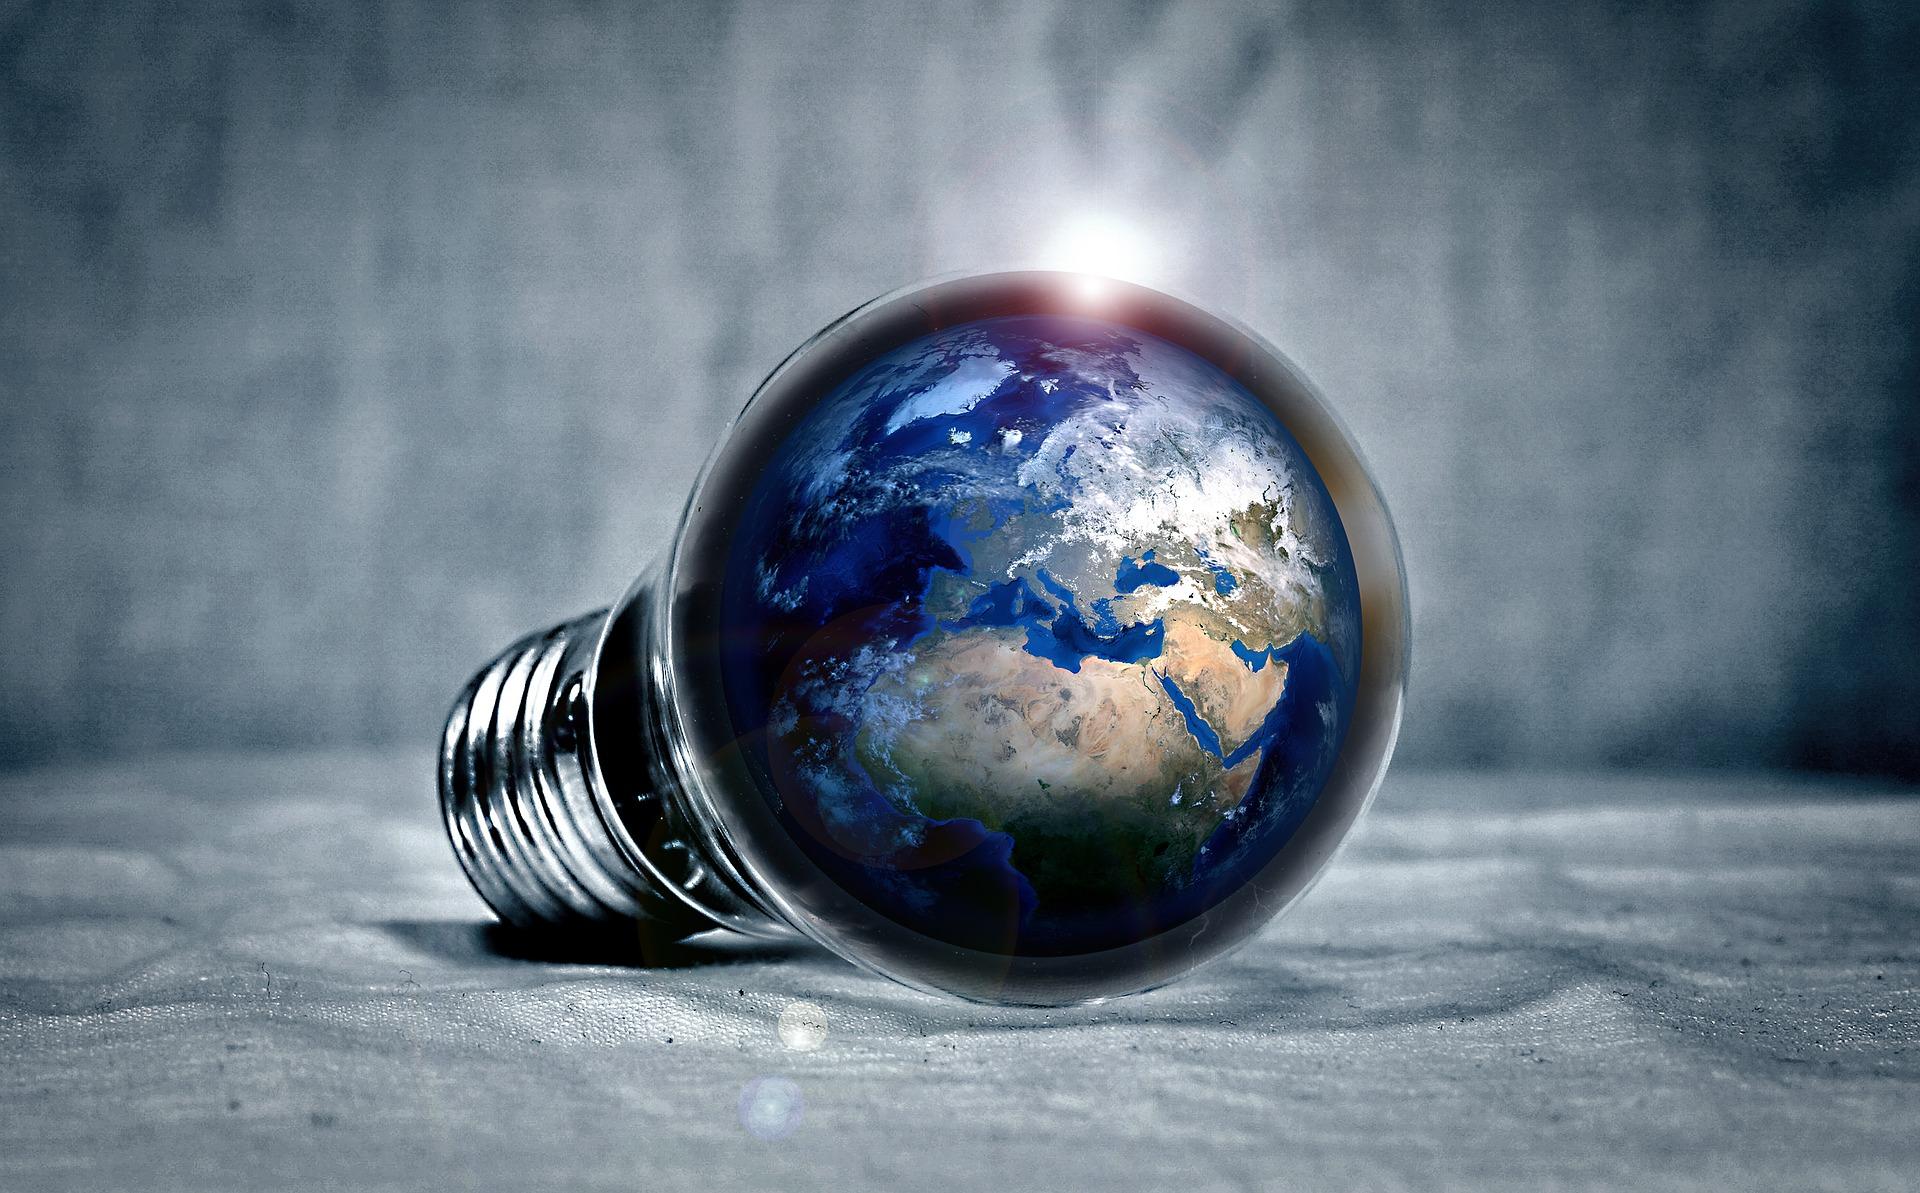 risparmio energetico legge diritti